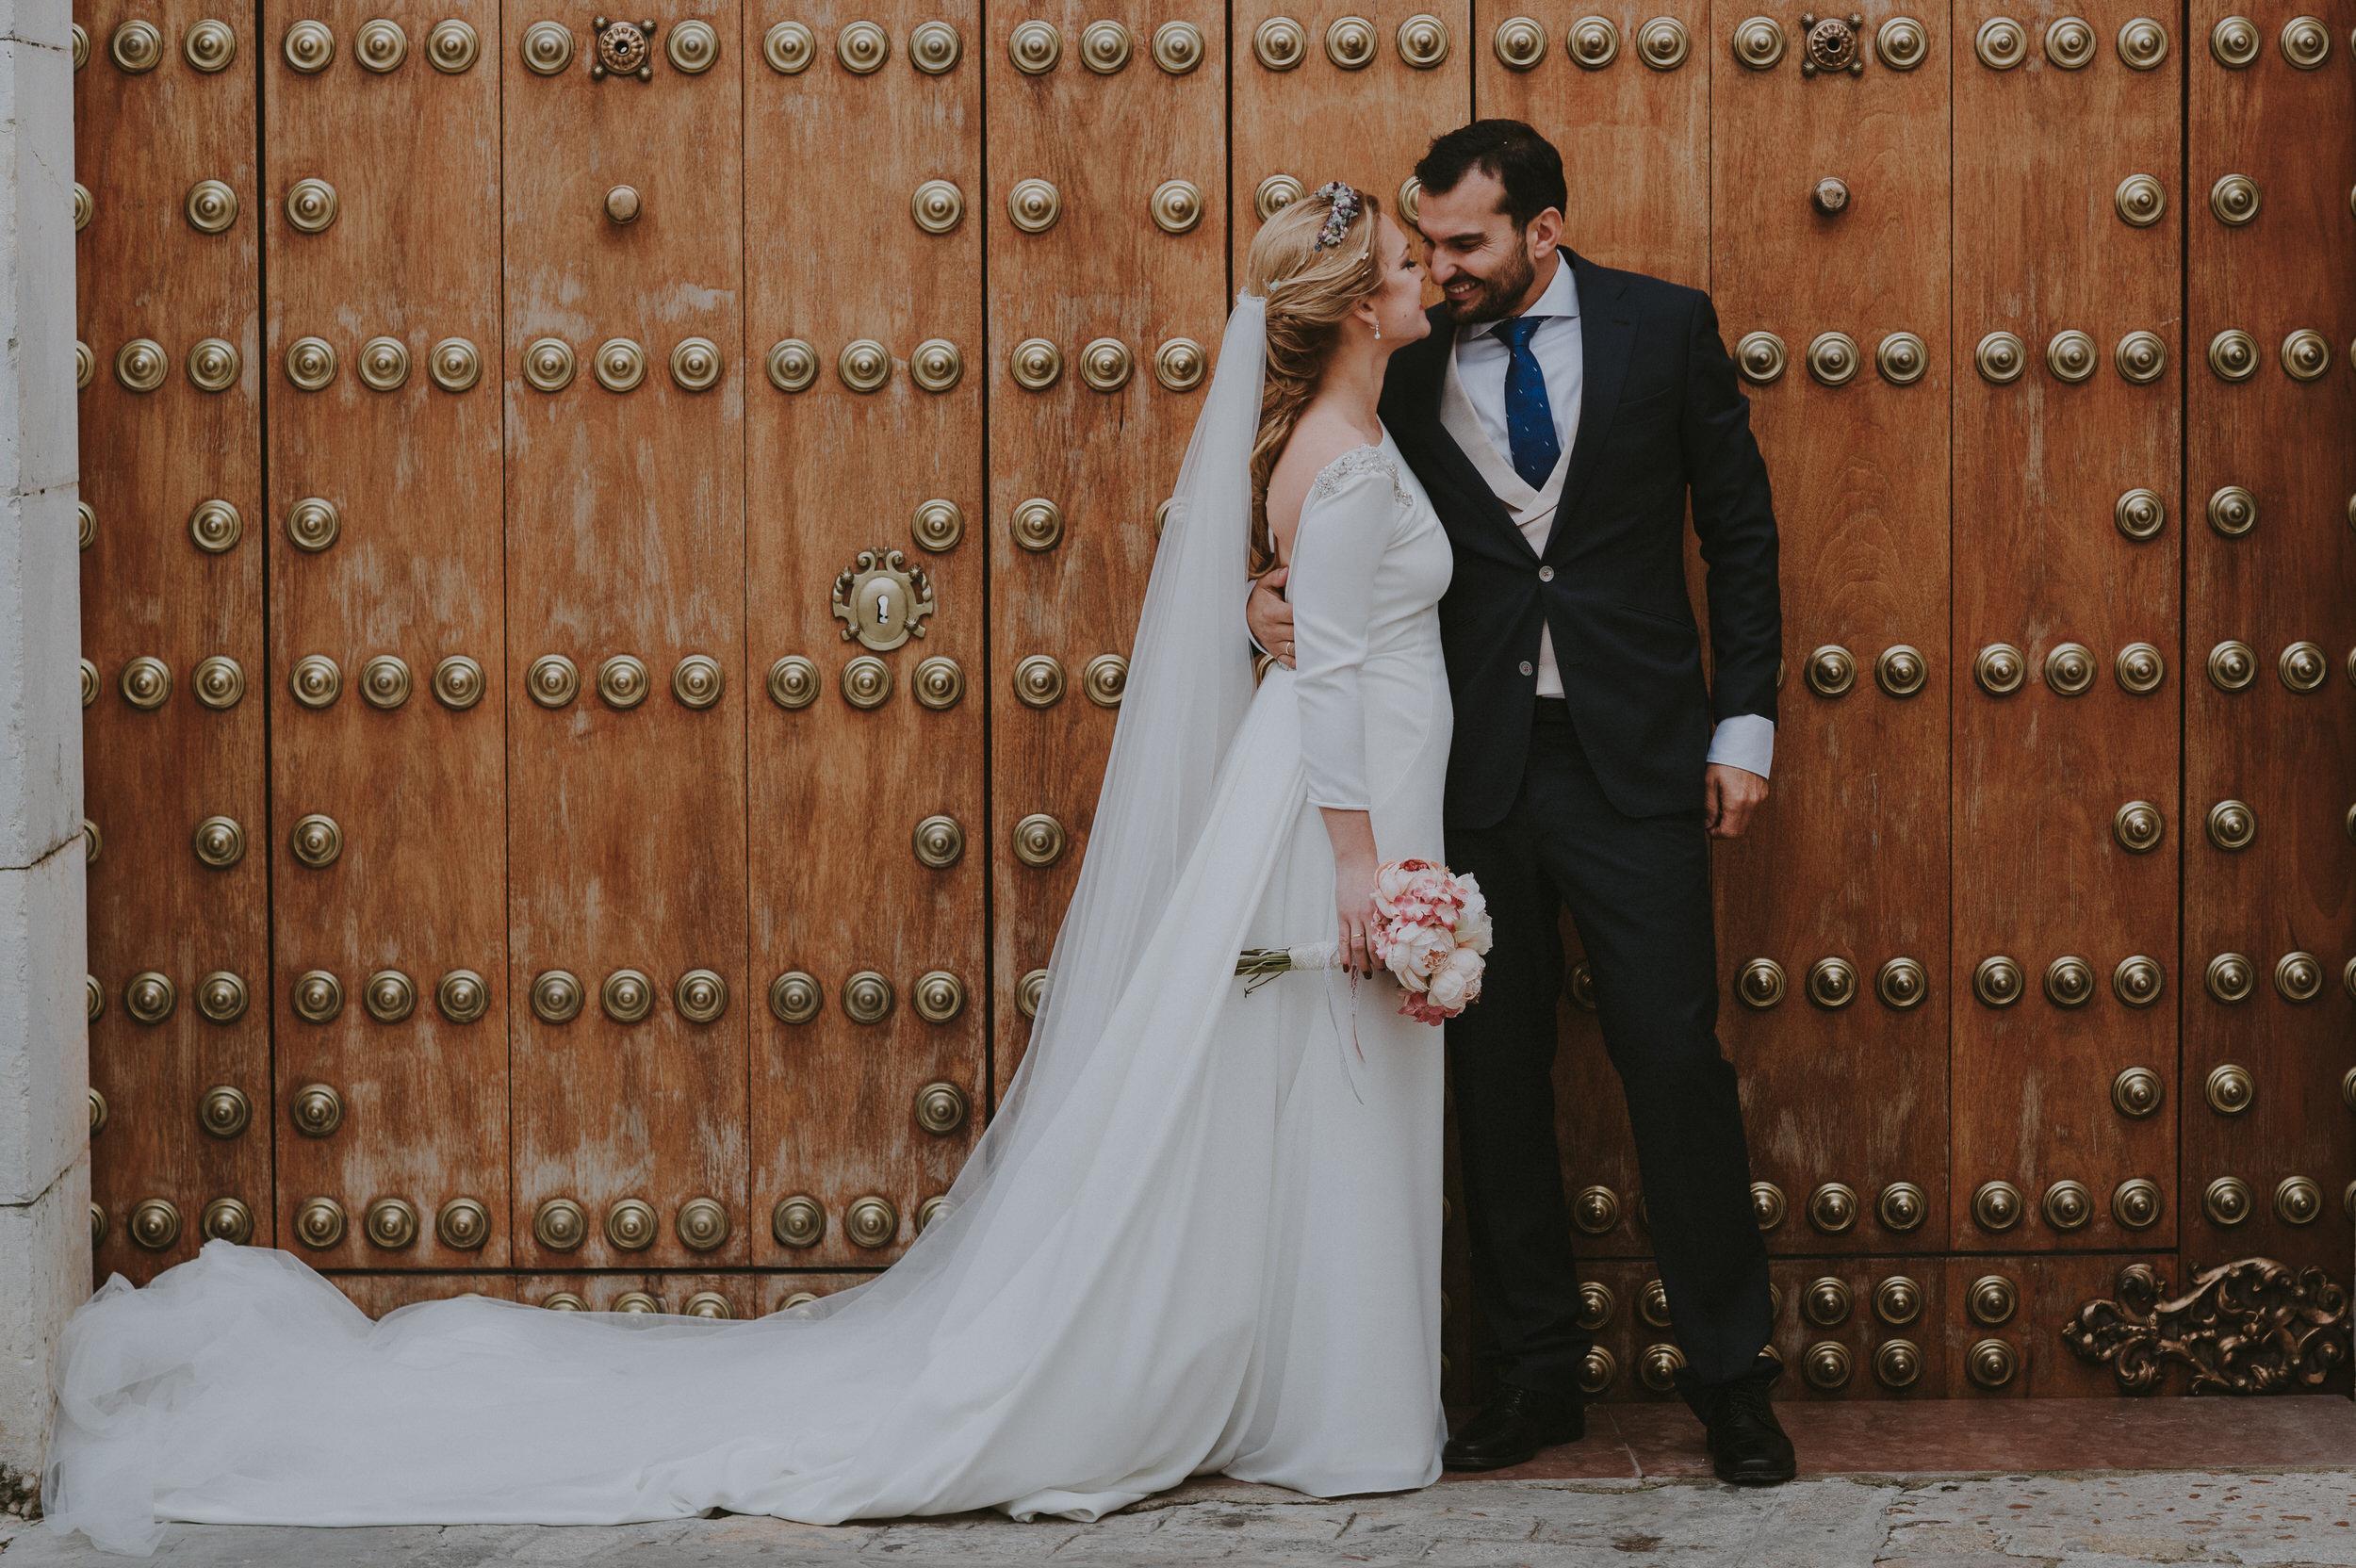 Cristina & Jero - Boda en Ecija - Iglesia Santa Ana - Fotógrafo Andrés Amarillo (43).JPG